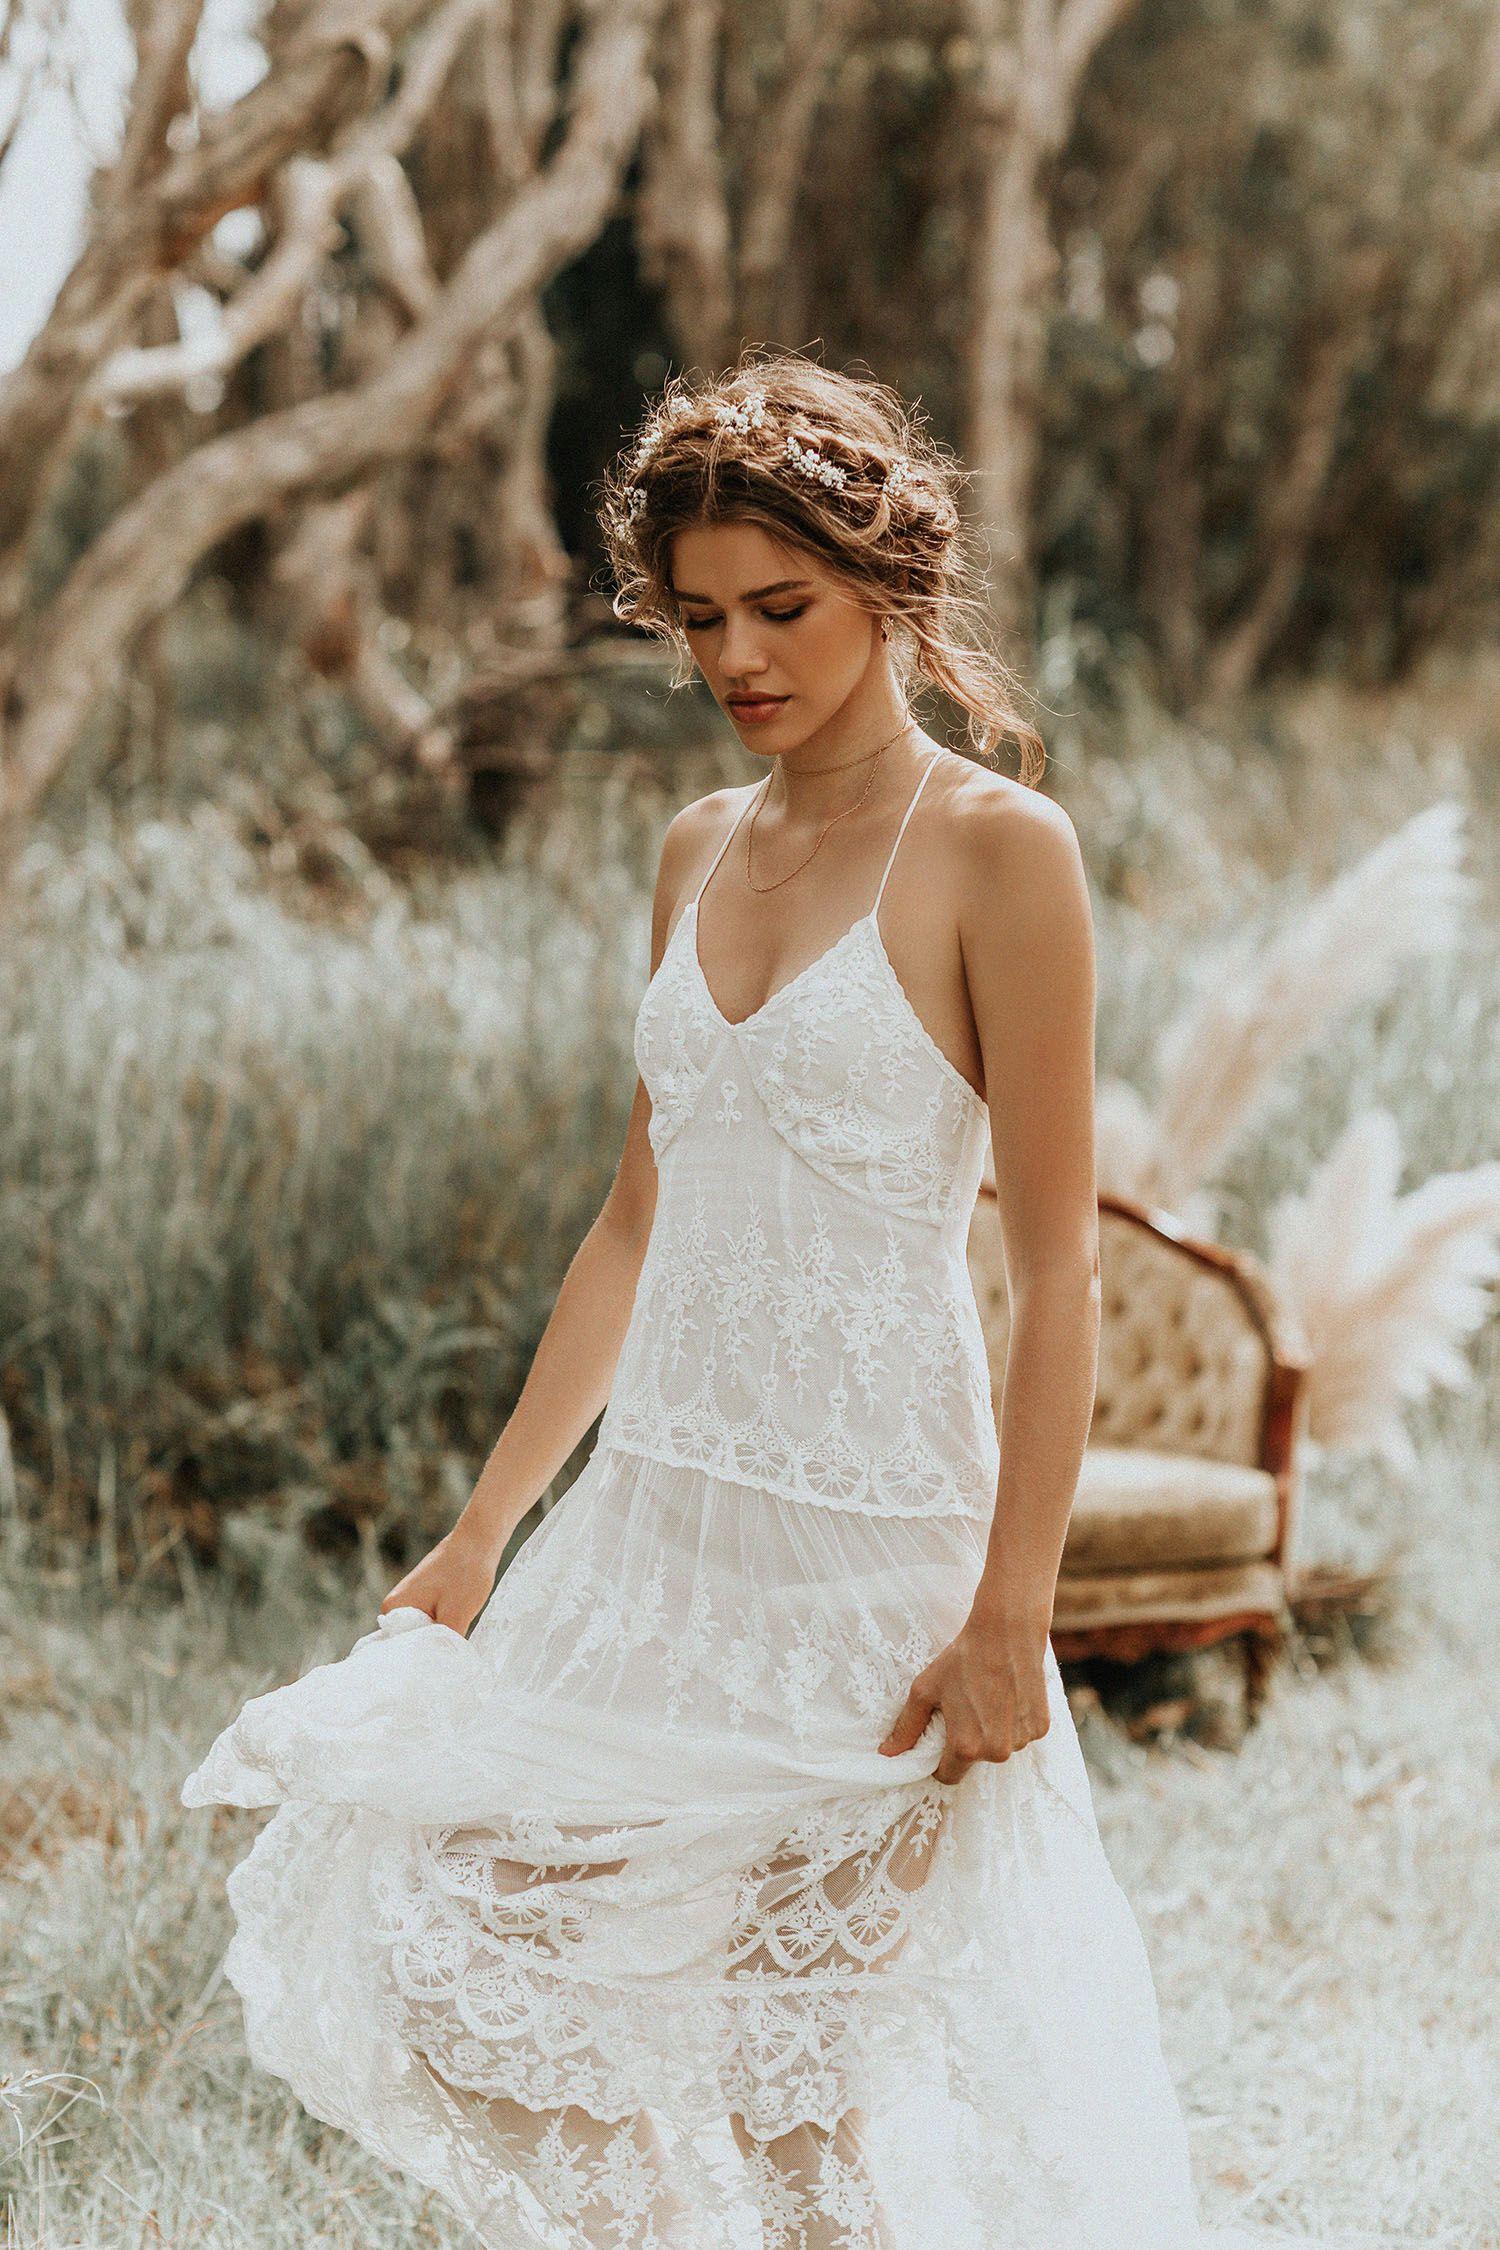 Spell bride boho weddings pinterest bohemian wedding and weddings